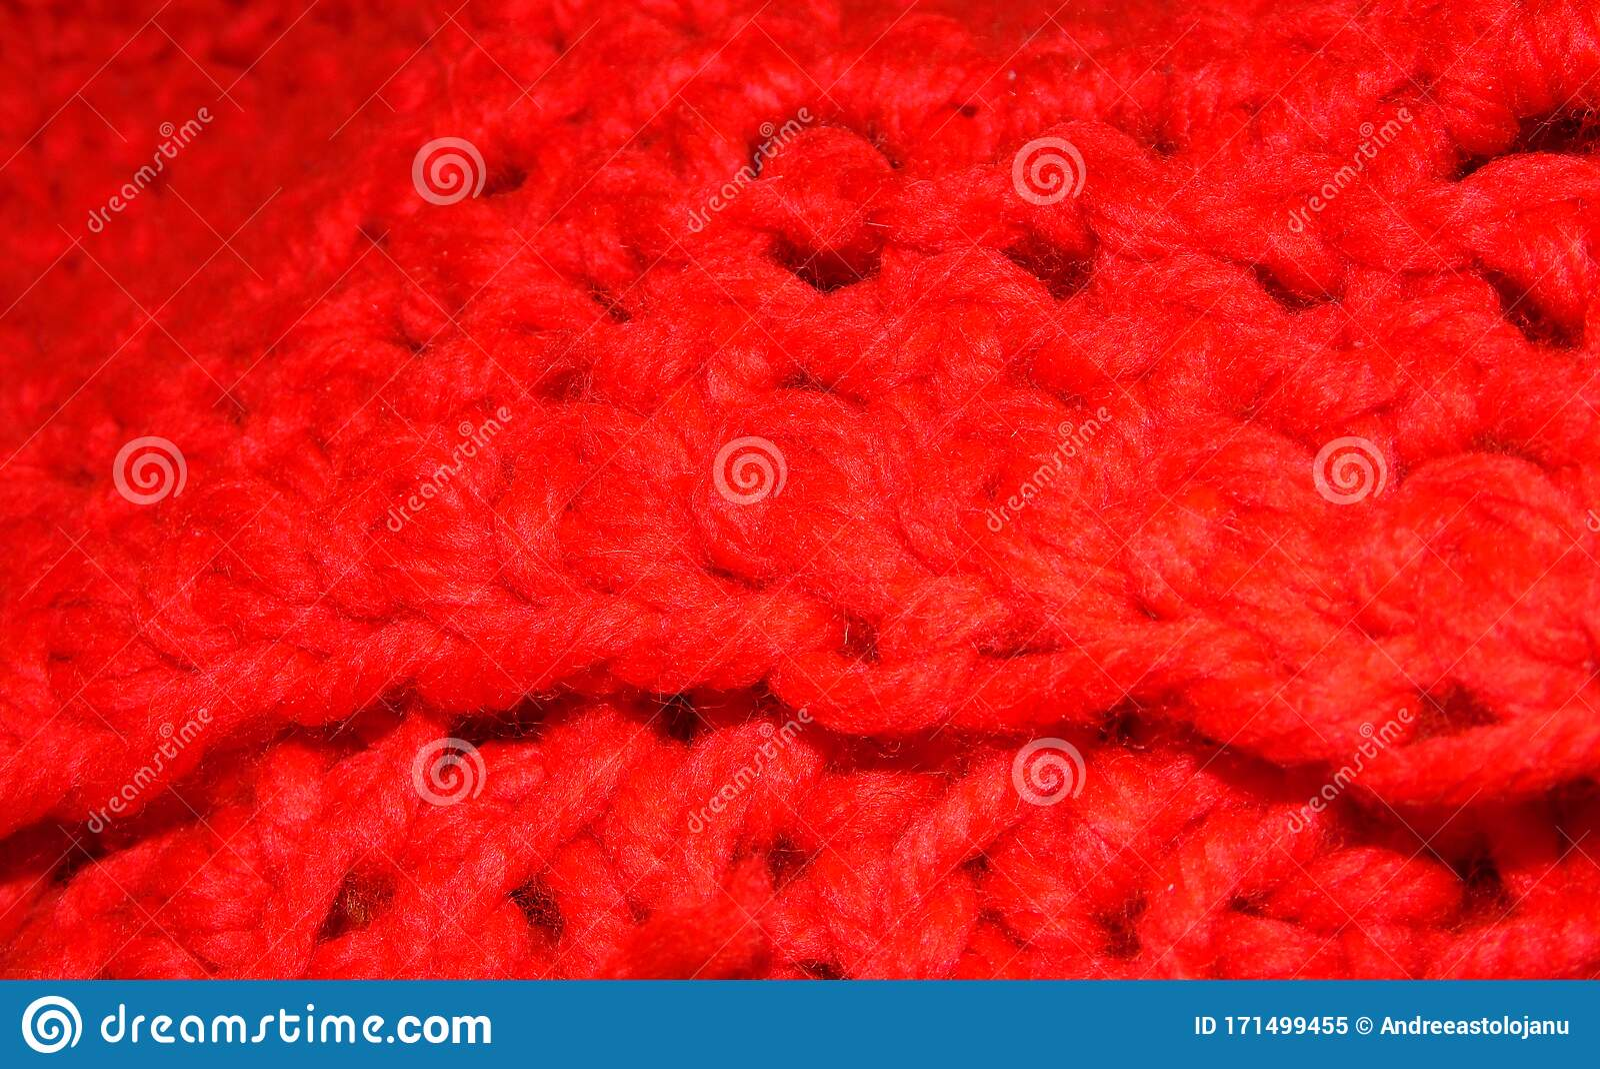 Background Of Closeup Of Red Crochet Dress Fashion Wool Stock Image Image Of Closeup Fashion 171499455